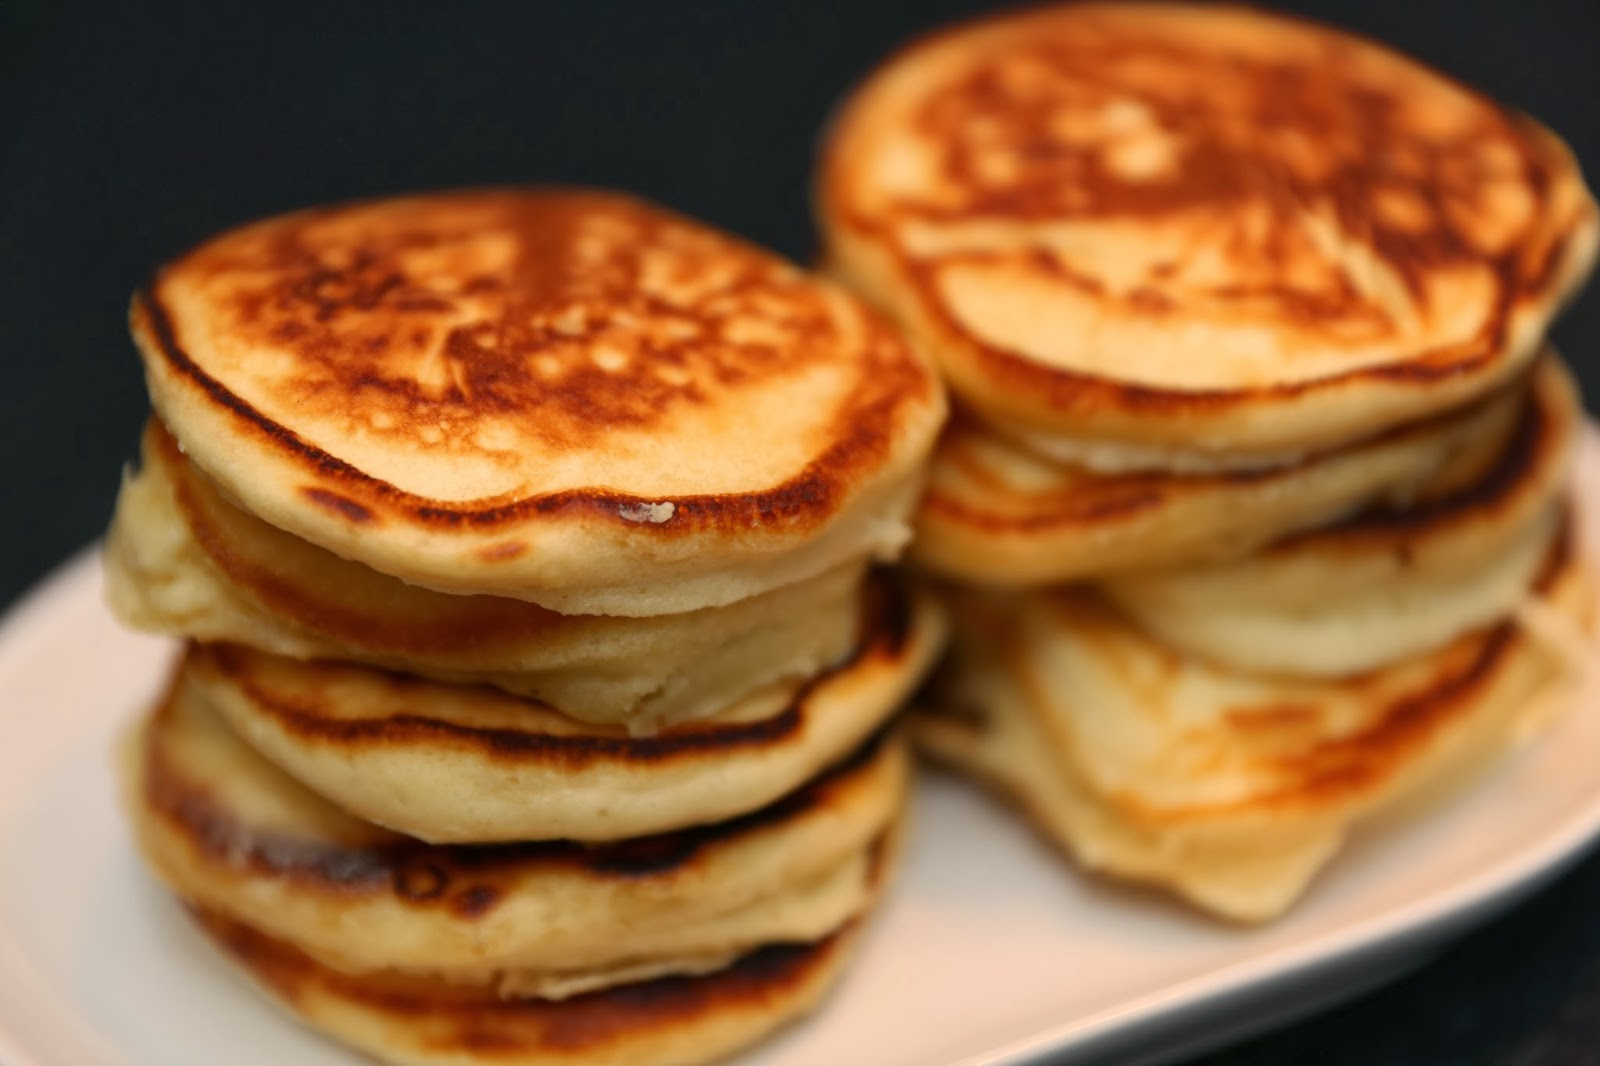 amerikanska pannkakor havremjölk